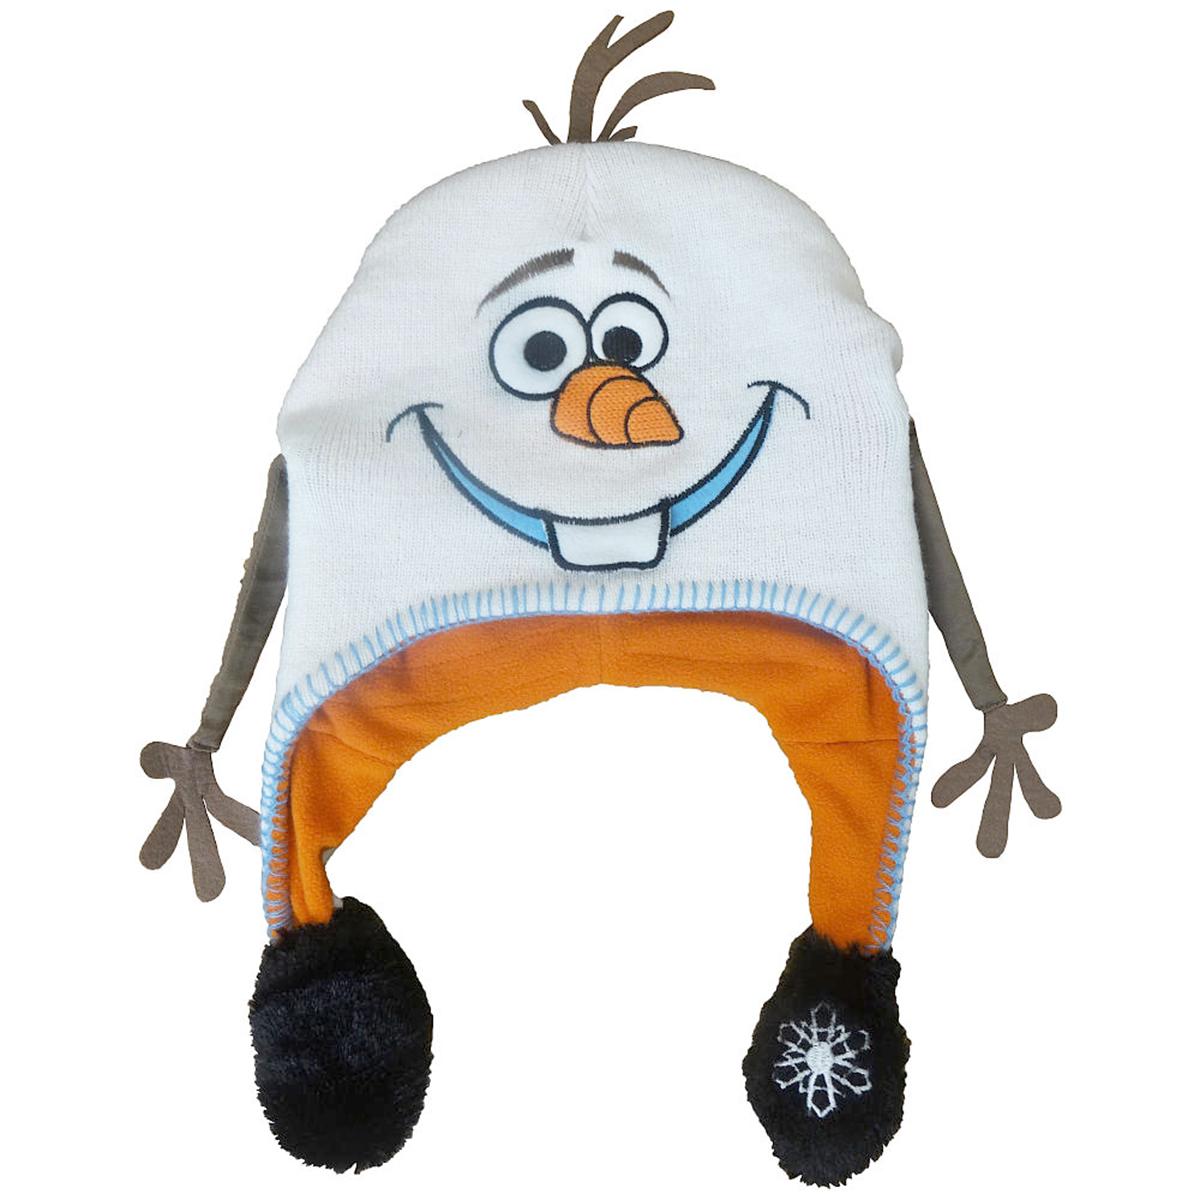 Flipeez Hats: Flipeez Fun Kids Action Hat Spiderman Olaf Elsa Captain